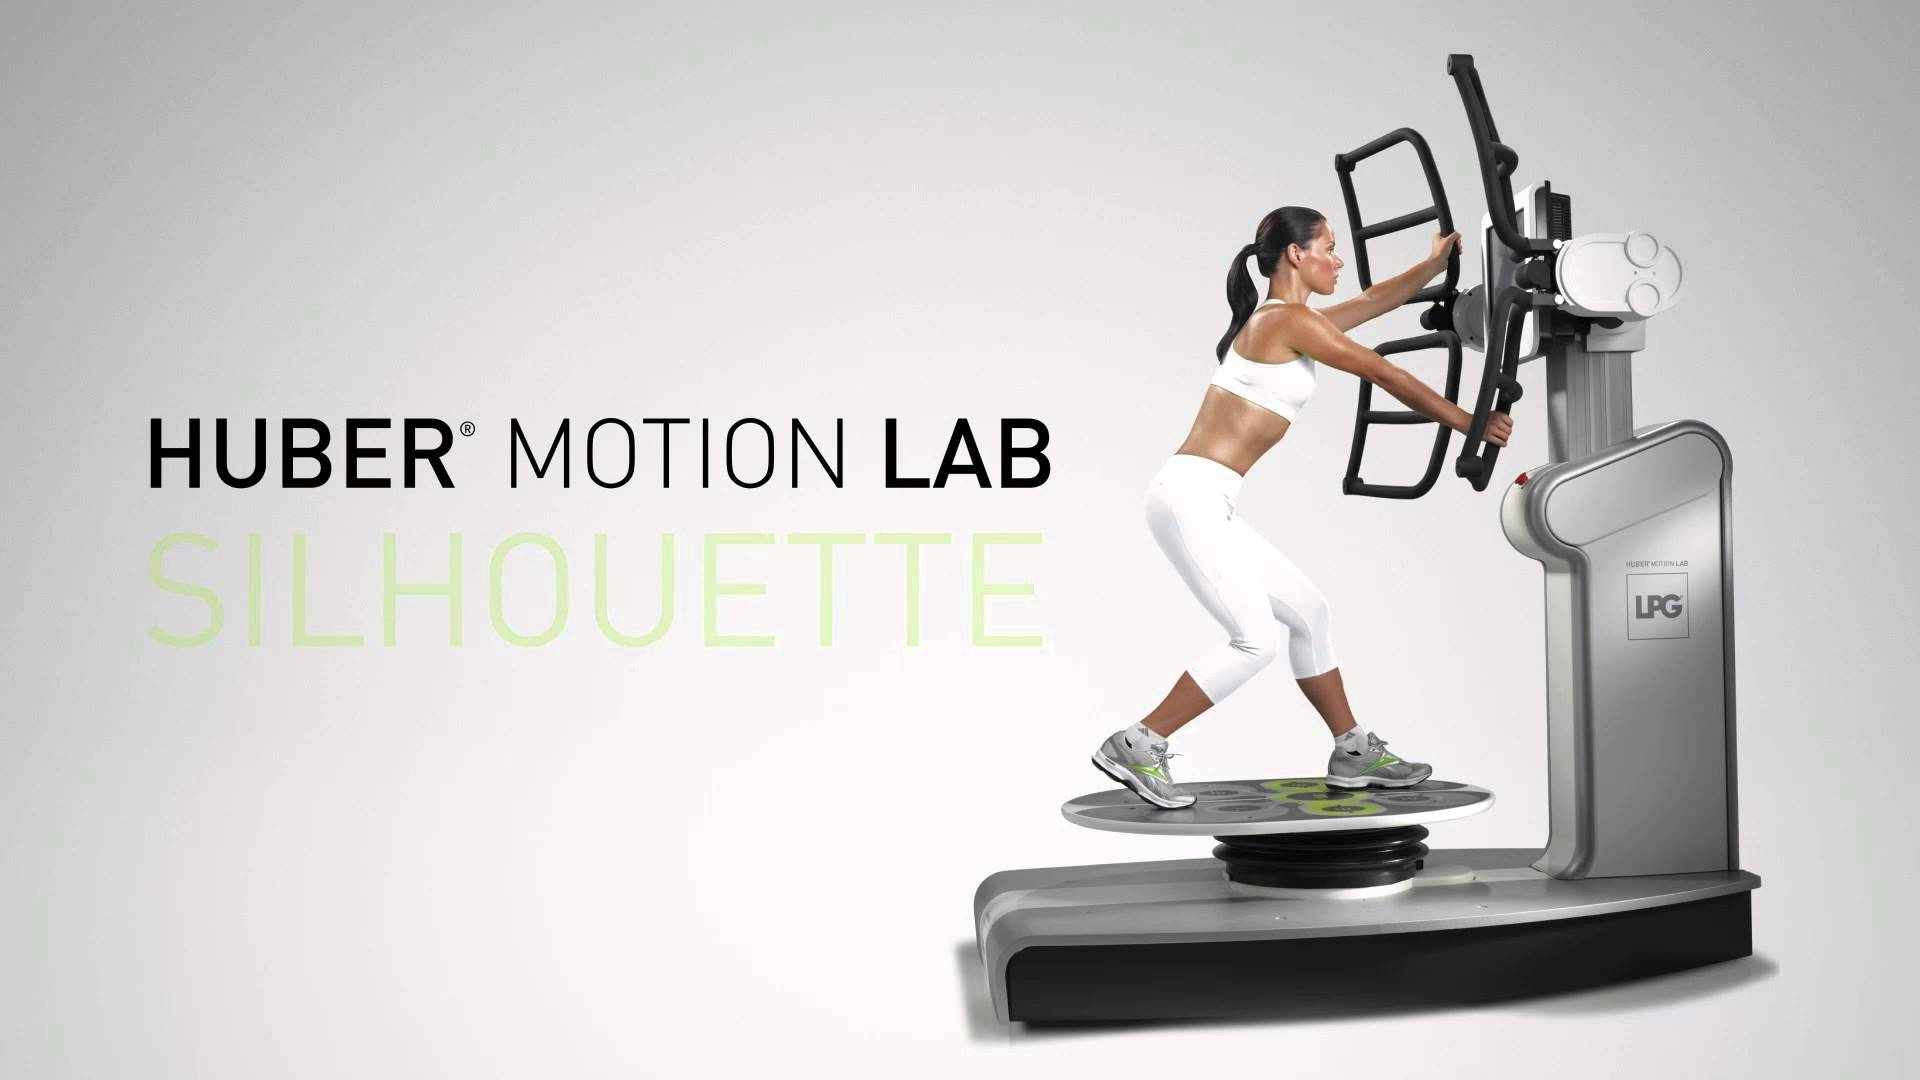 huber motion lab kine castelnau